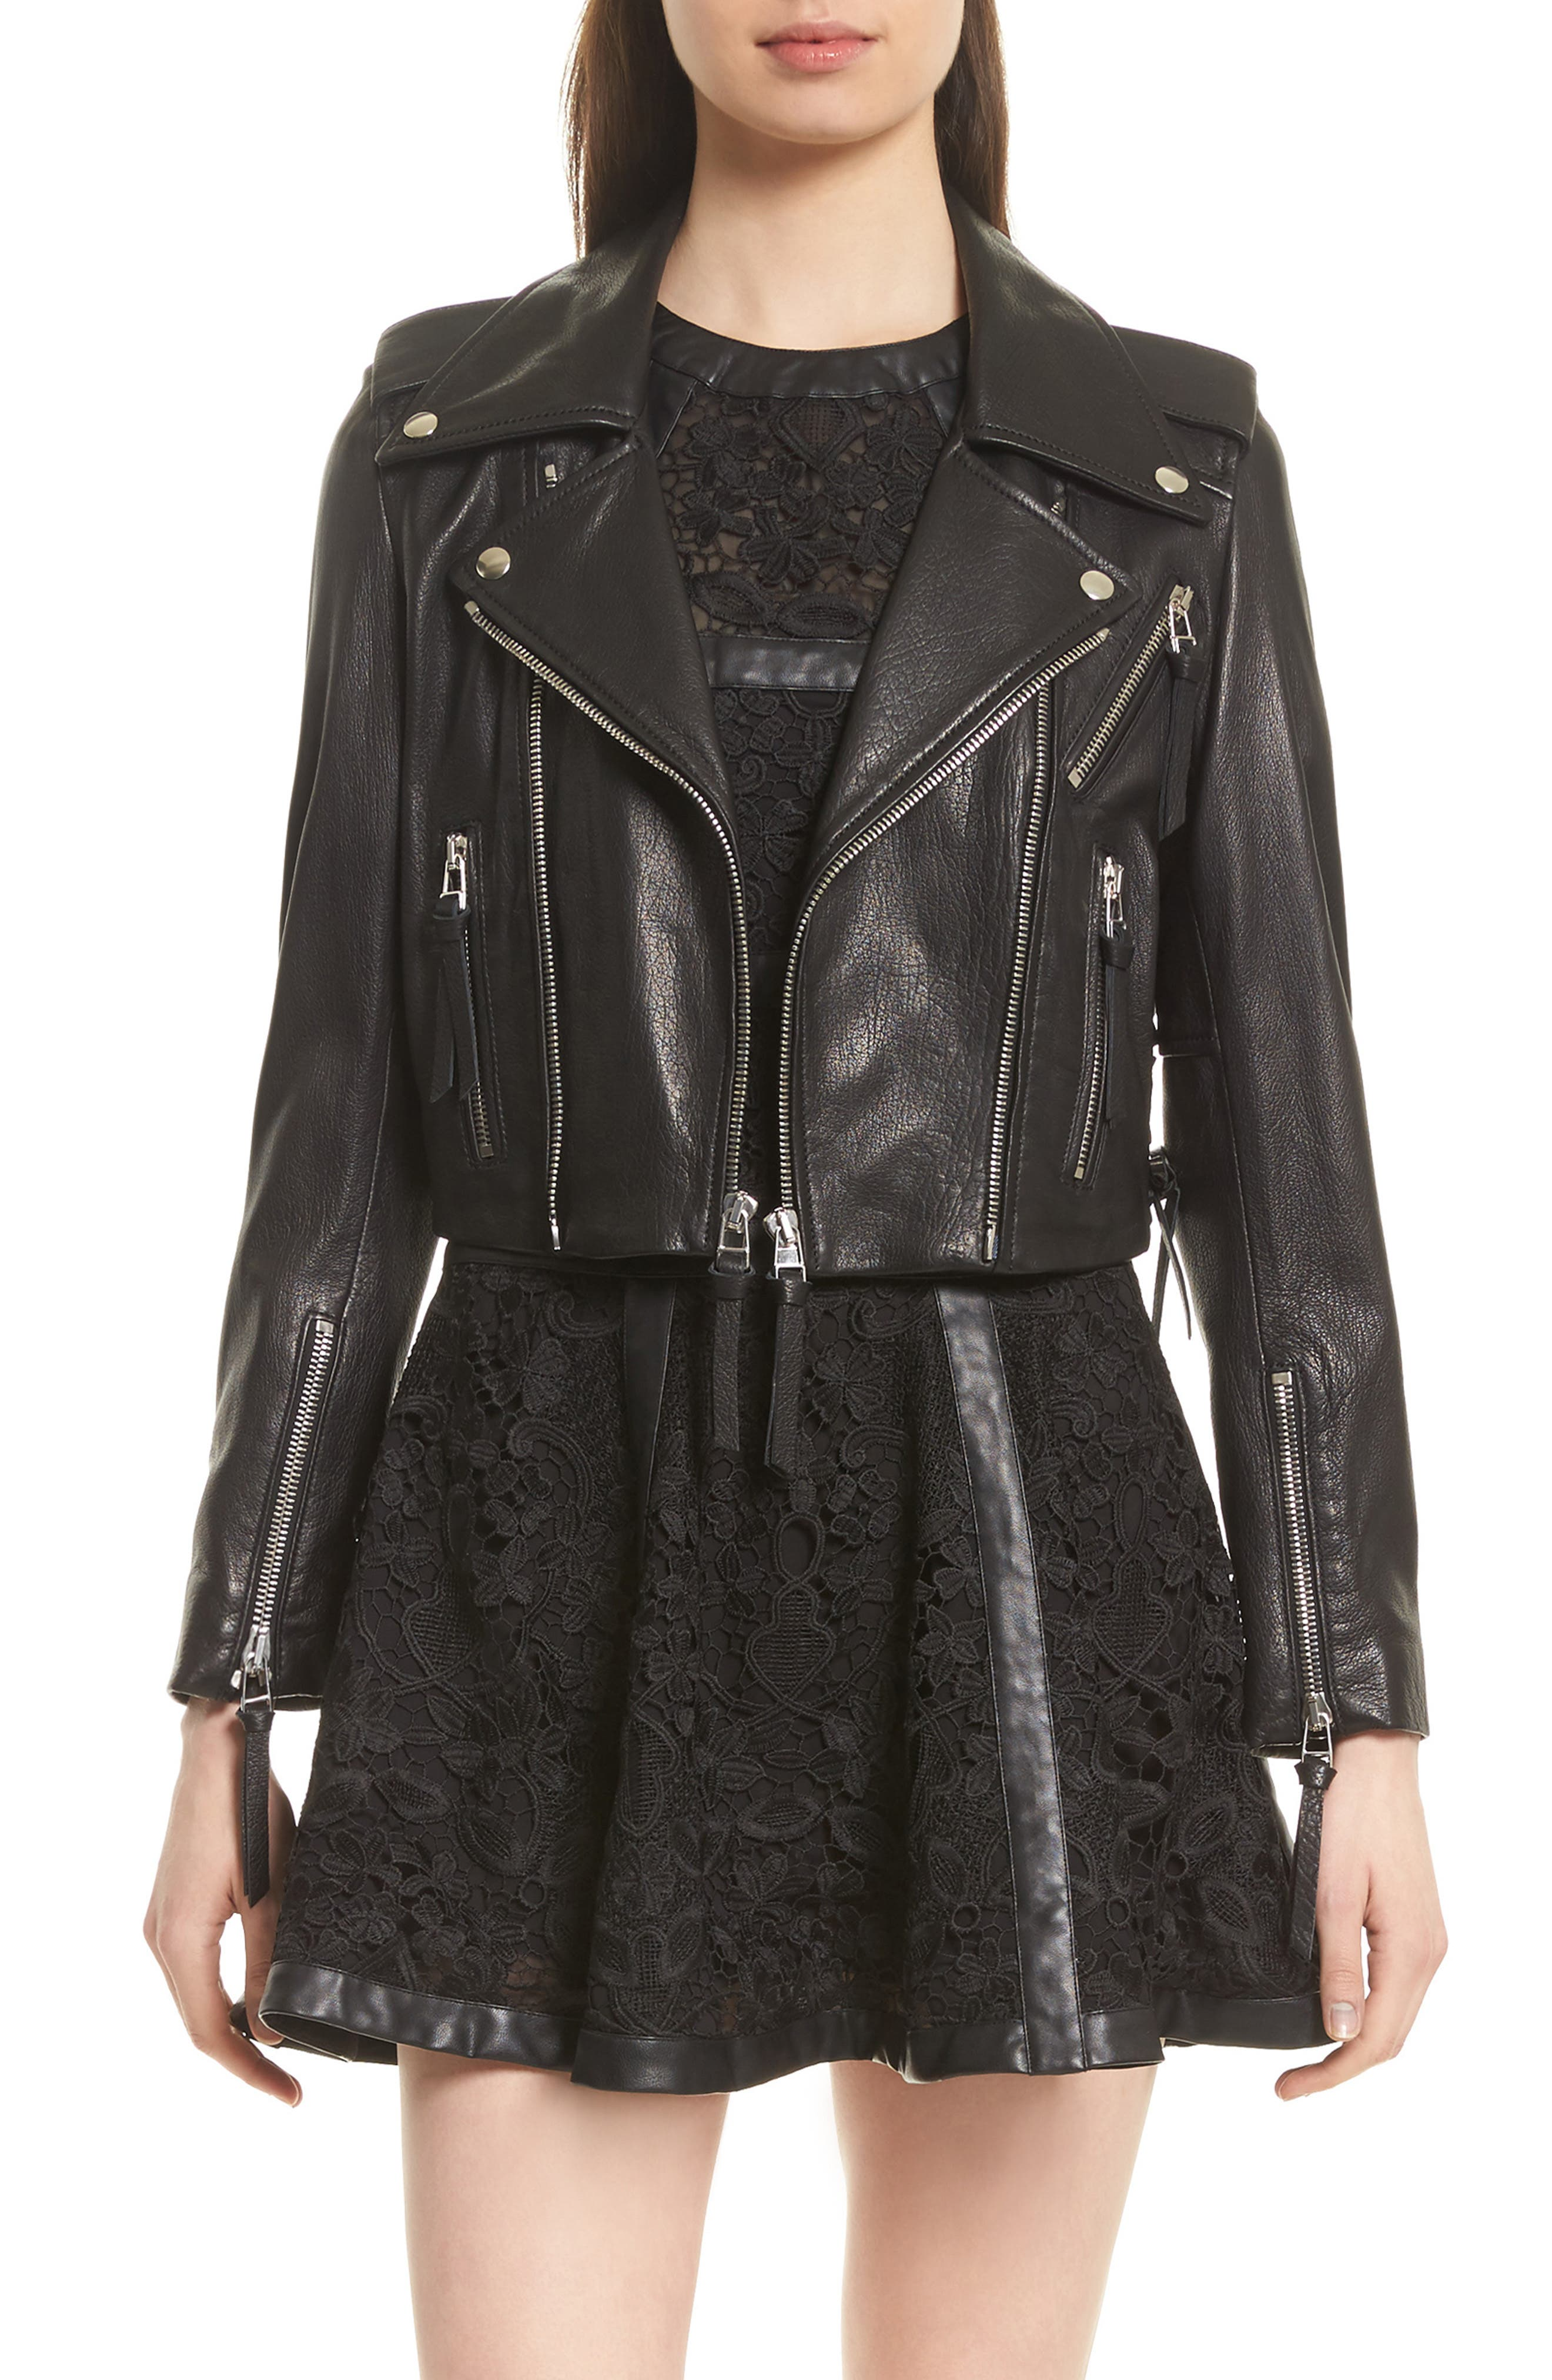 Main Image - The Kooples Lace-Up Lambskin Leather Jacket